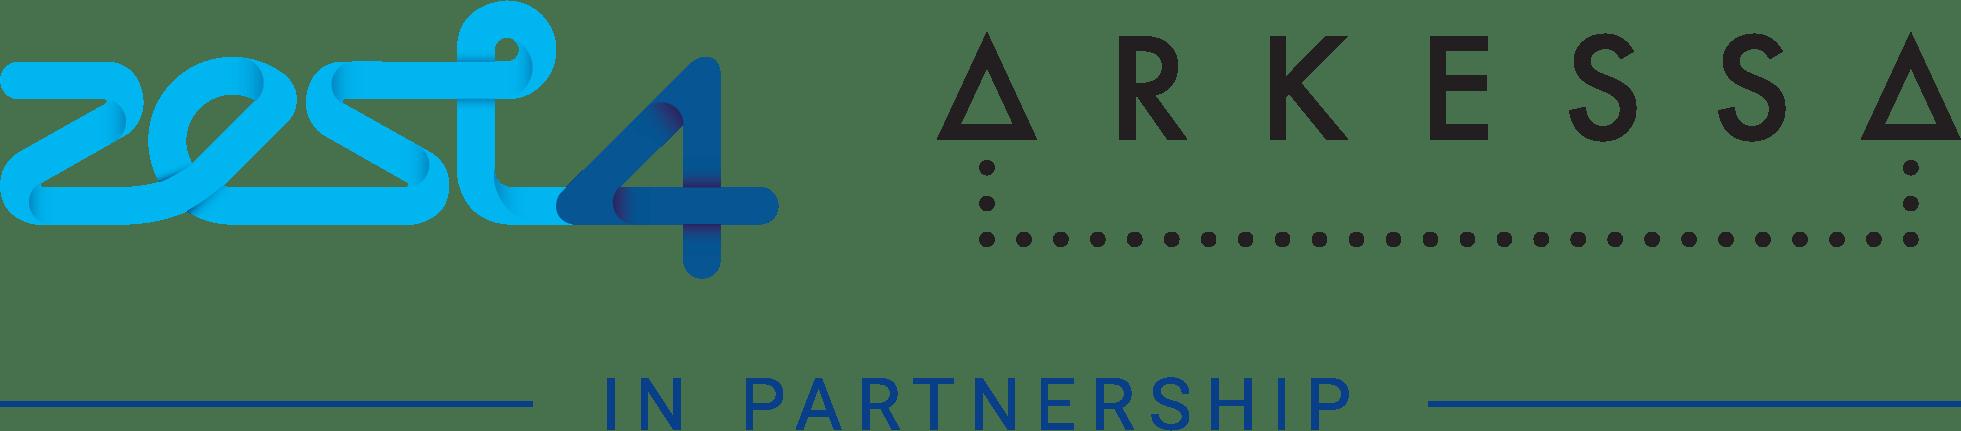 Zest4 Arkessa Partnership Logos